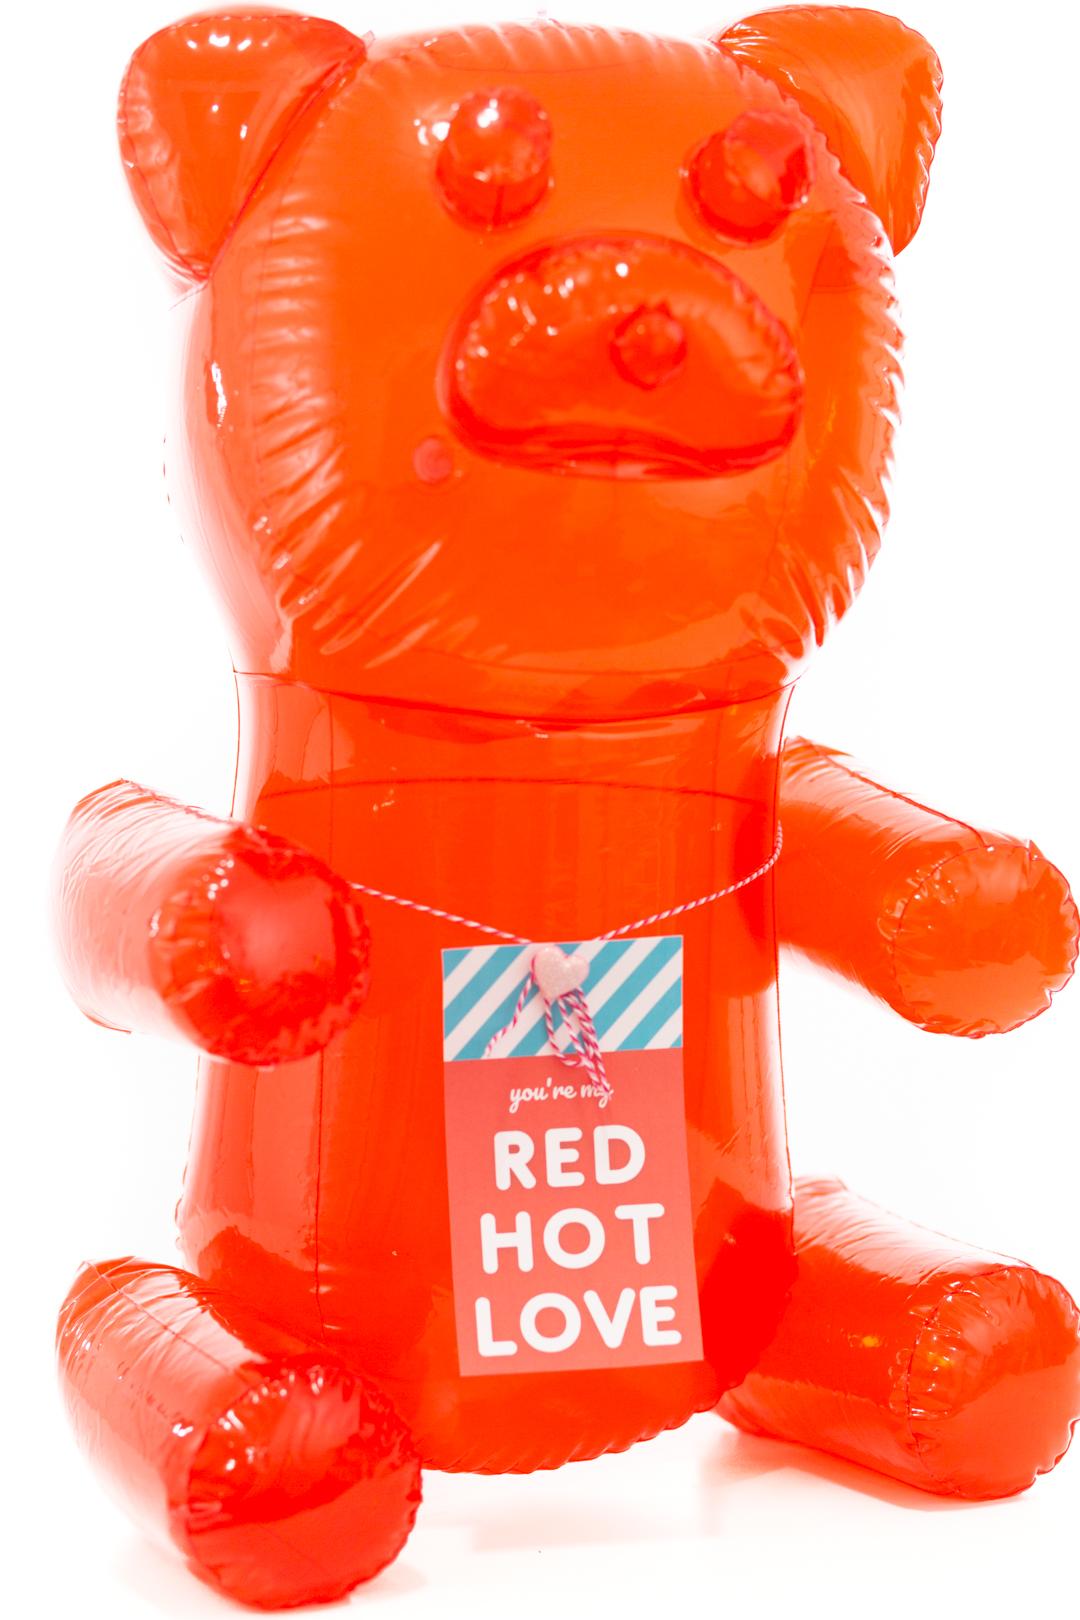 Red hot love = cute blow up gummy bear gift idea.